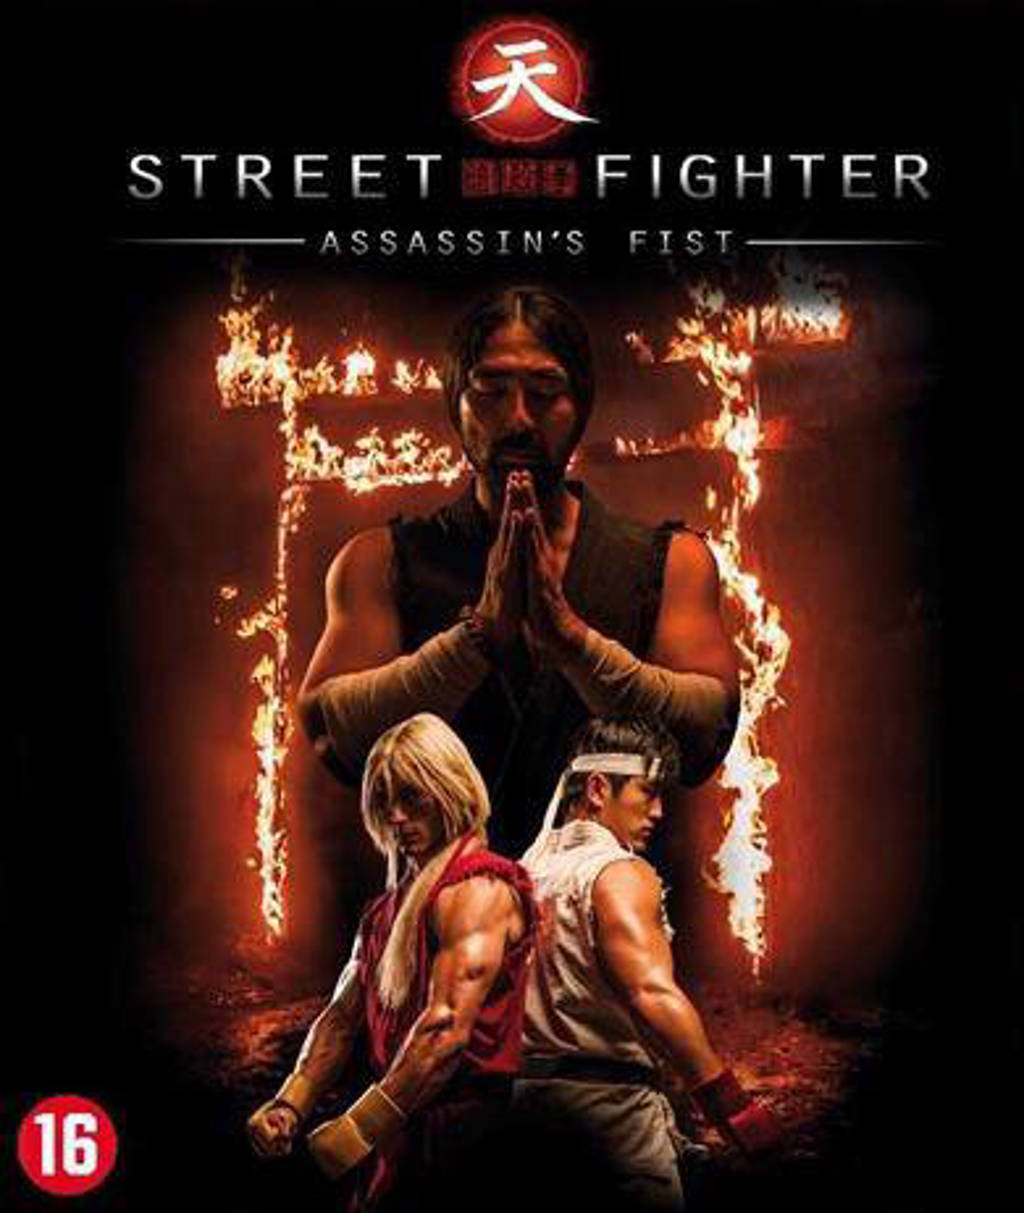 Street fighter - Assassins fist (Blu-ray)